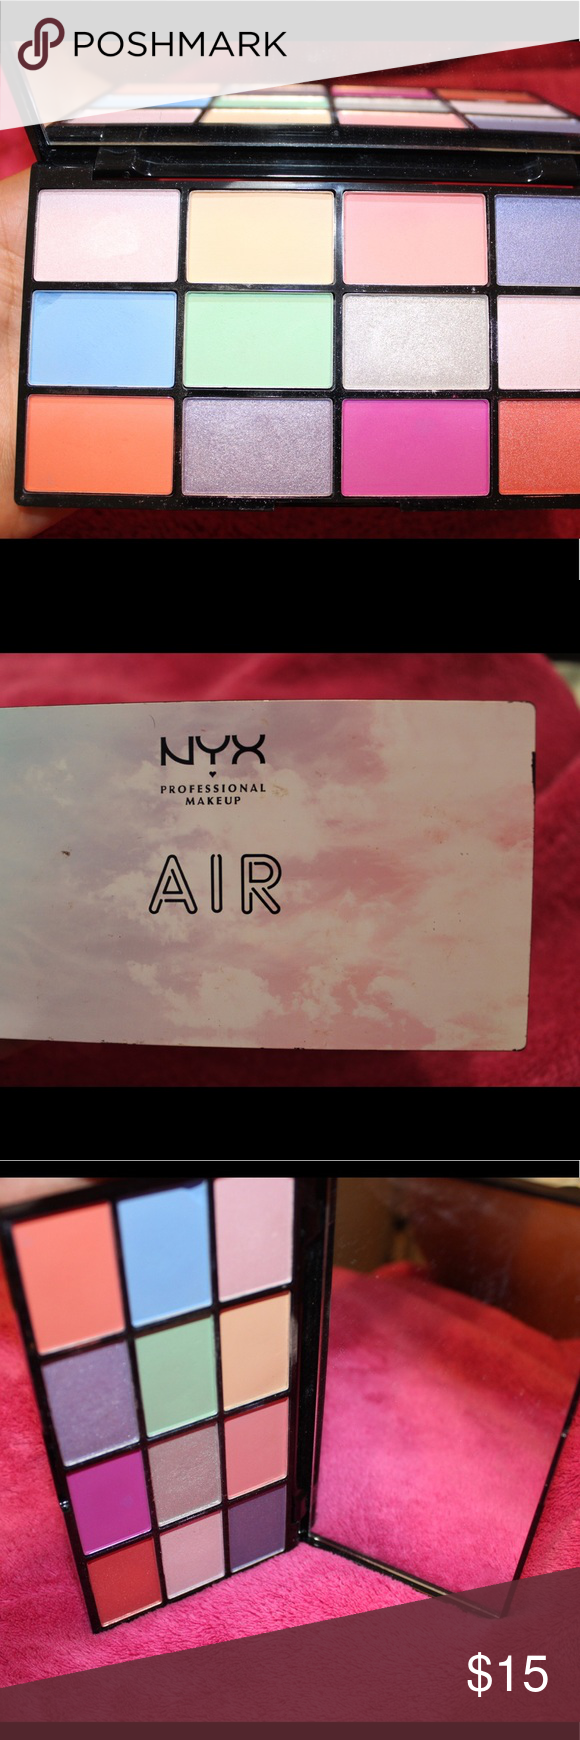 NYX AIR EYESHADOW PALETTE Gently used NYX AIR Palette